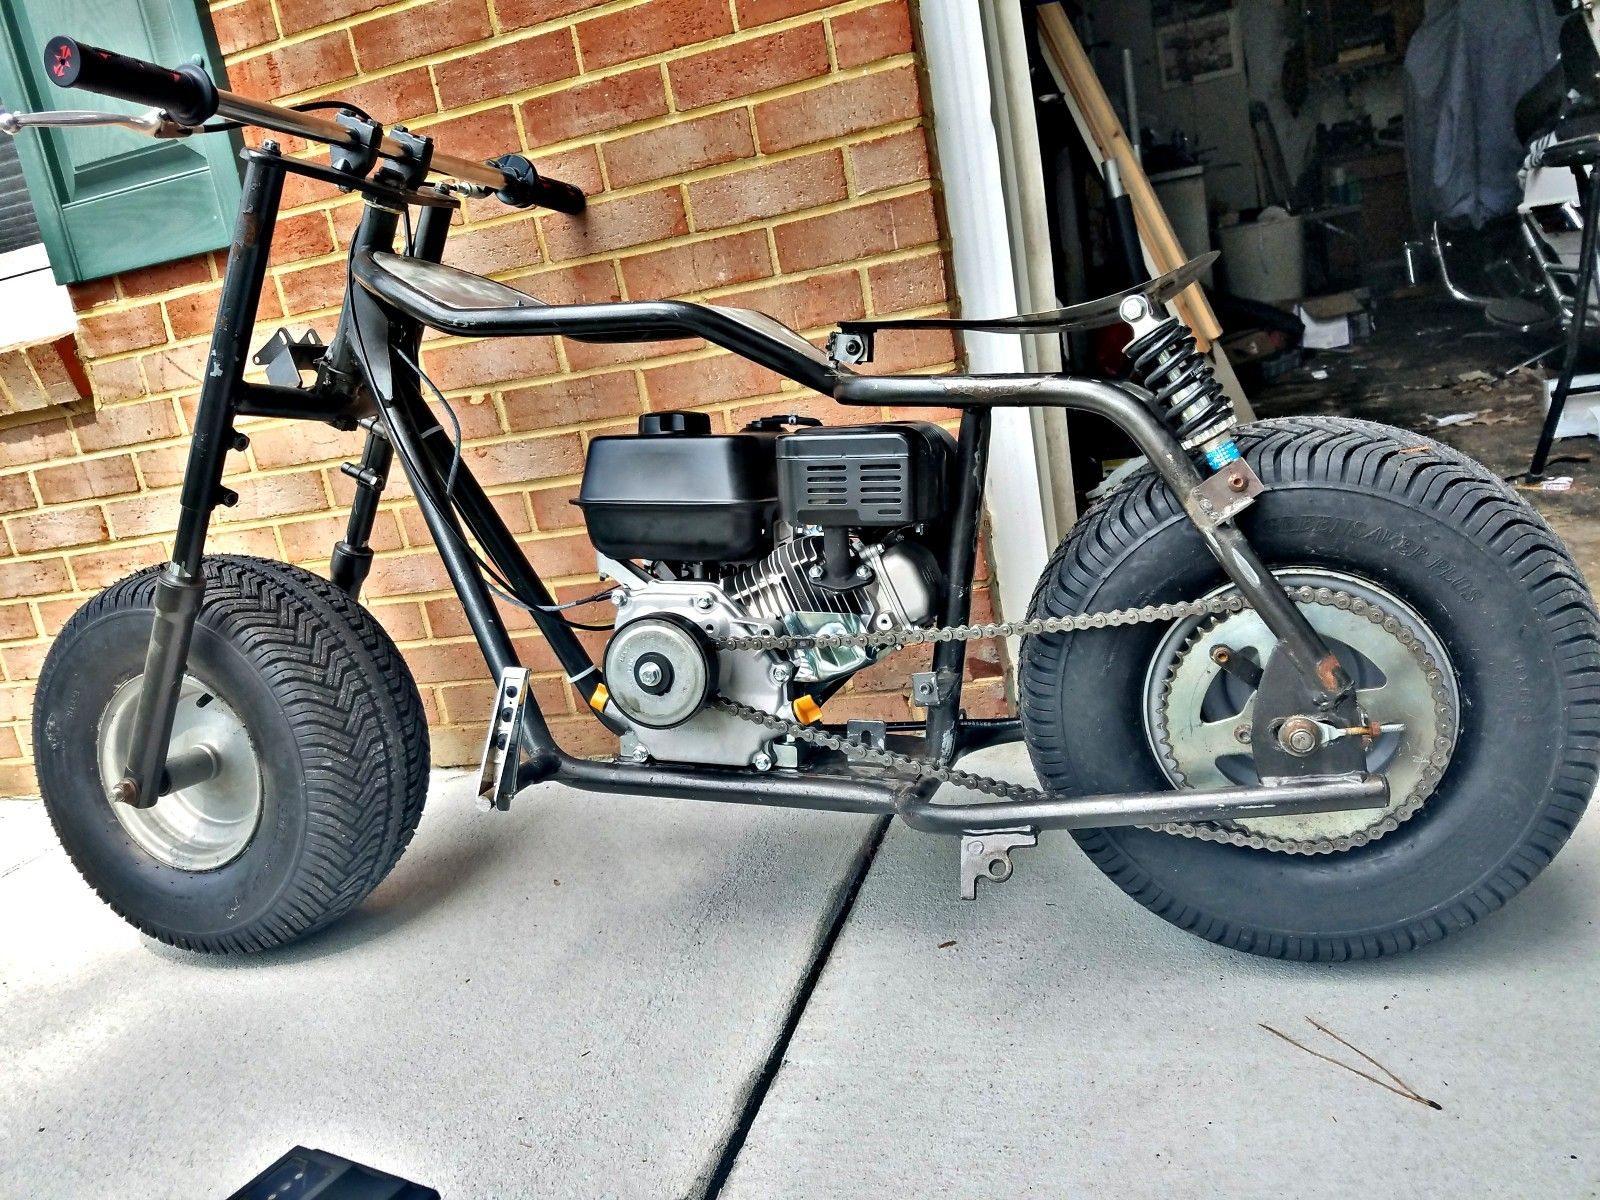 Custom Firehawk Minibike Getting Some New Life And Looking Good